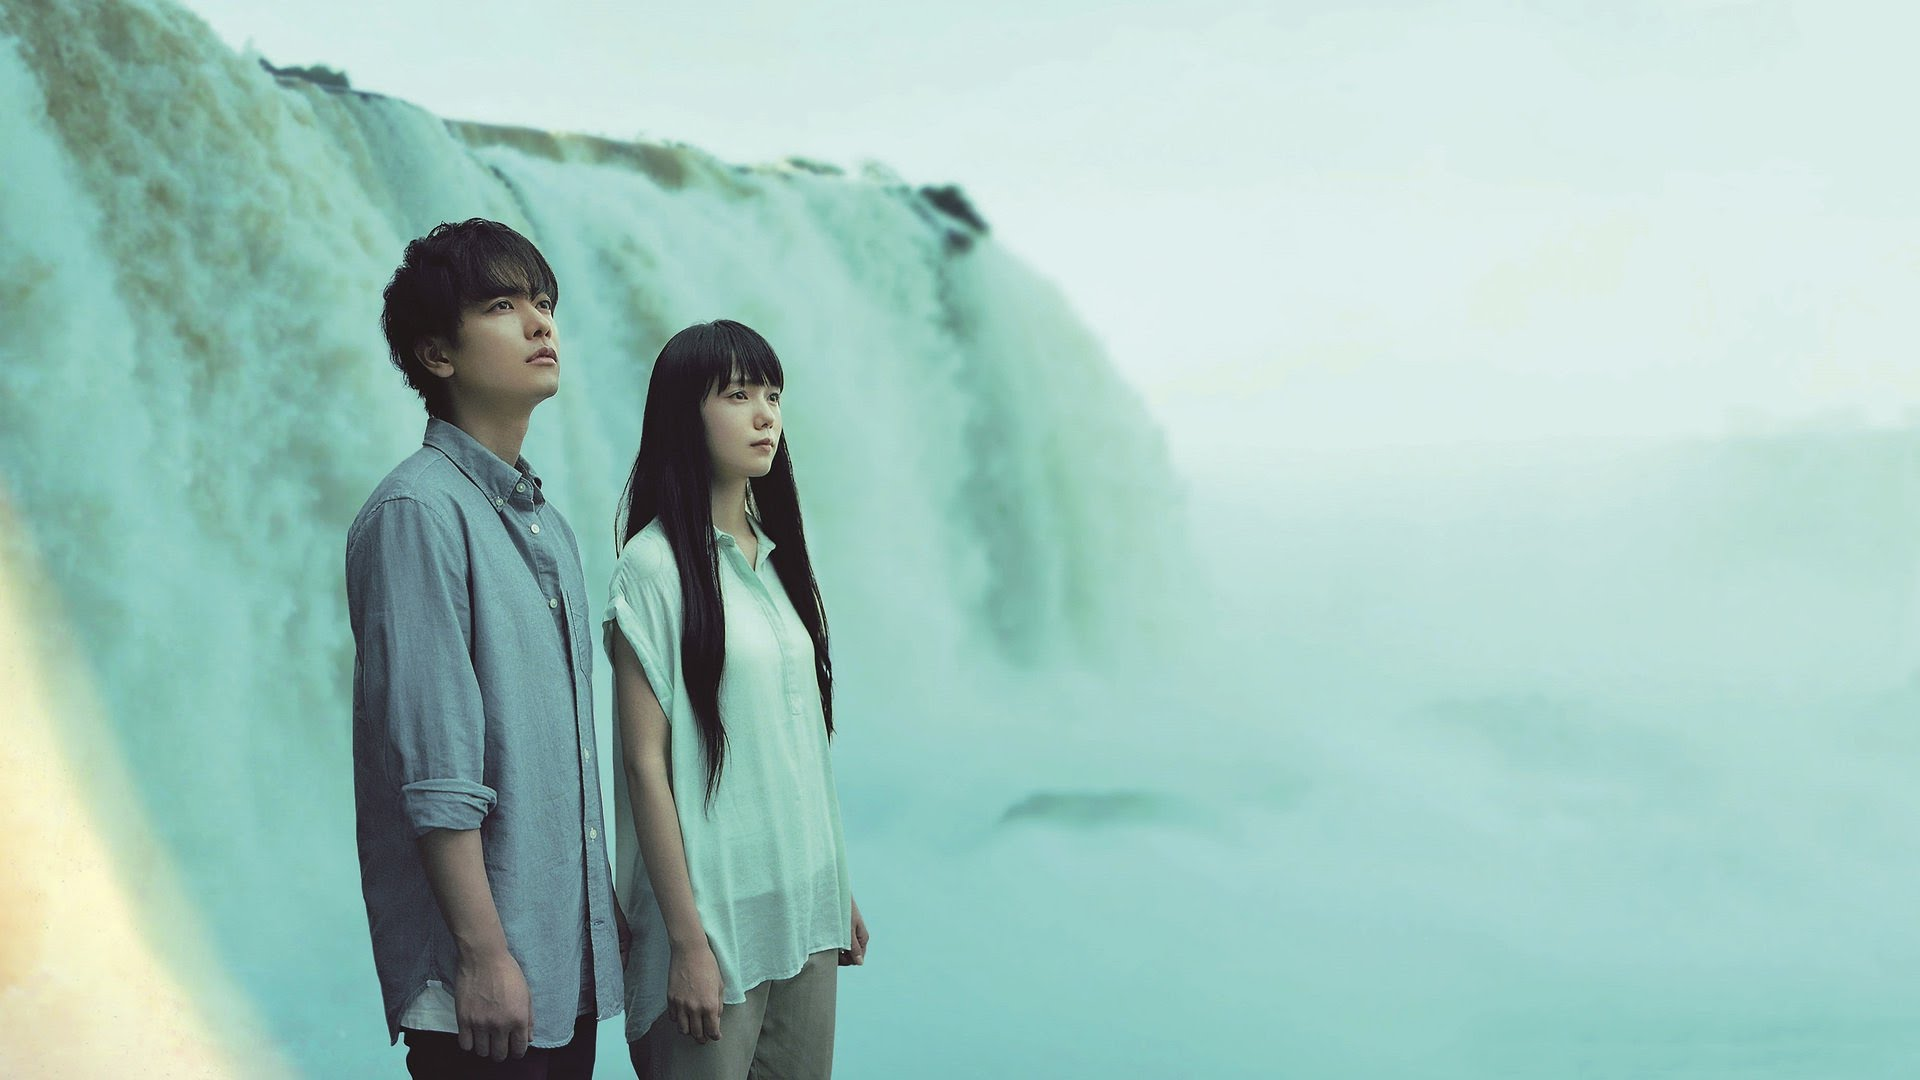 Takeru Satoh and Aoi Miyazaki star in director Akira Nagai's  If Cat's Disappeared From the World